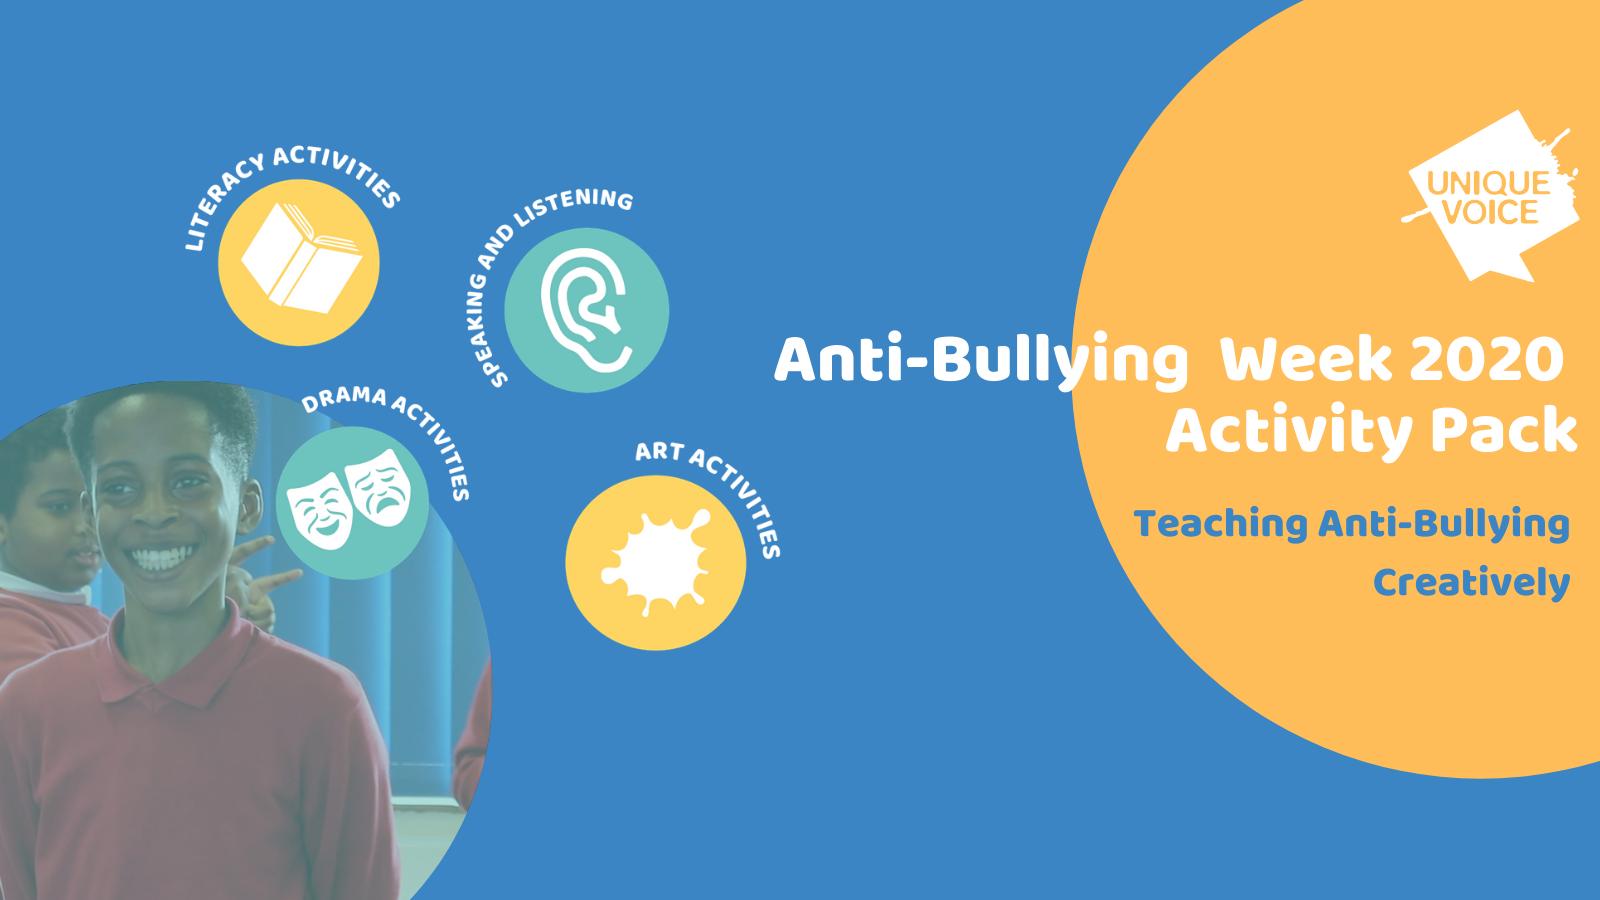 Anti-Bullying Activity Pack